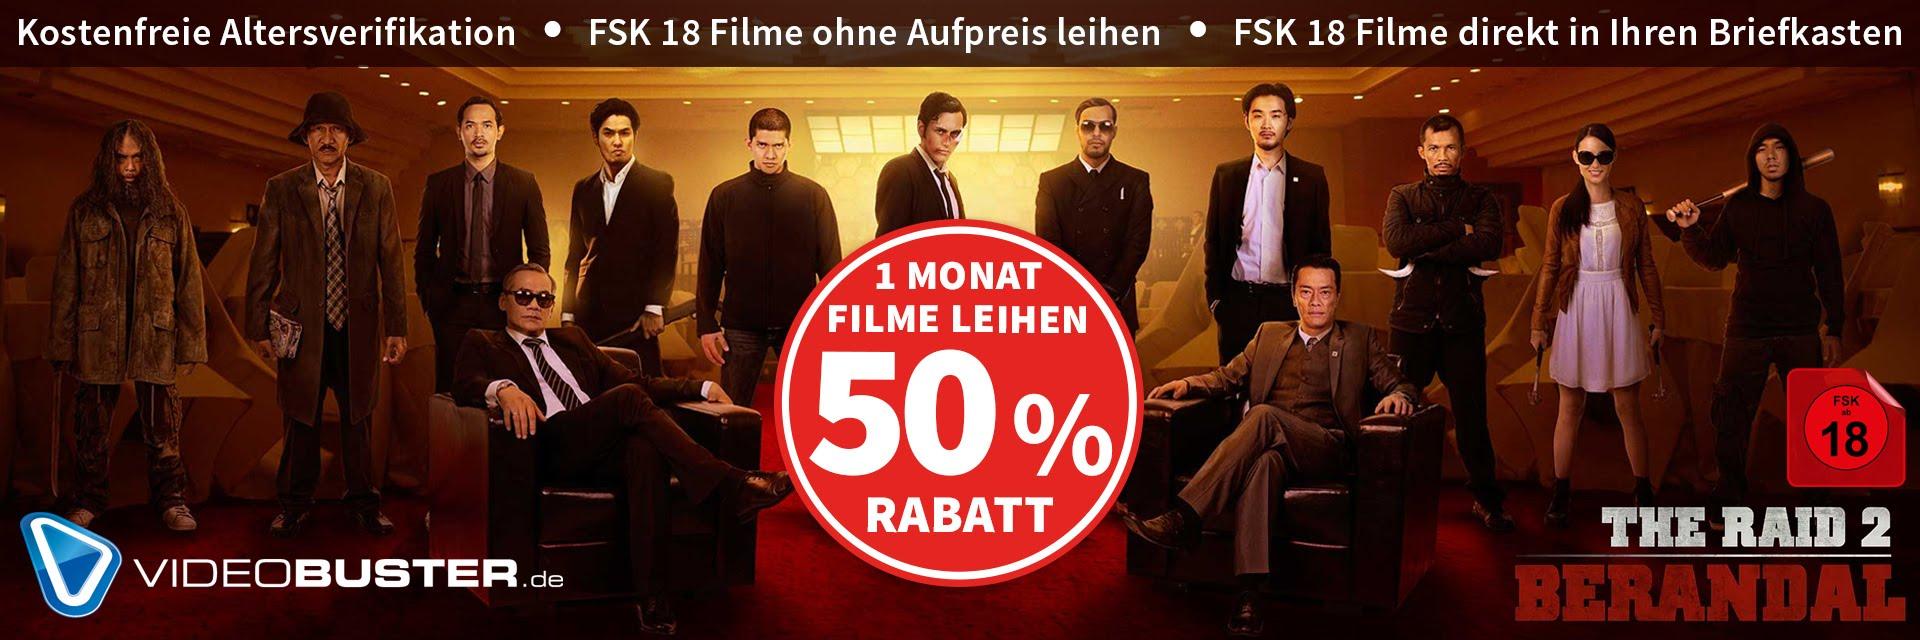 Videobuster 1 Monat mit 50% Rabatt testen!